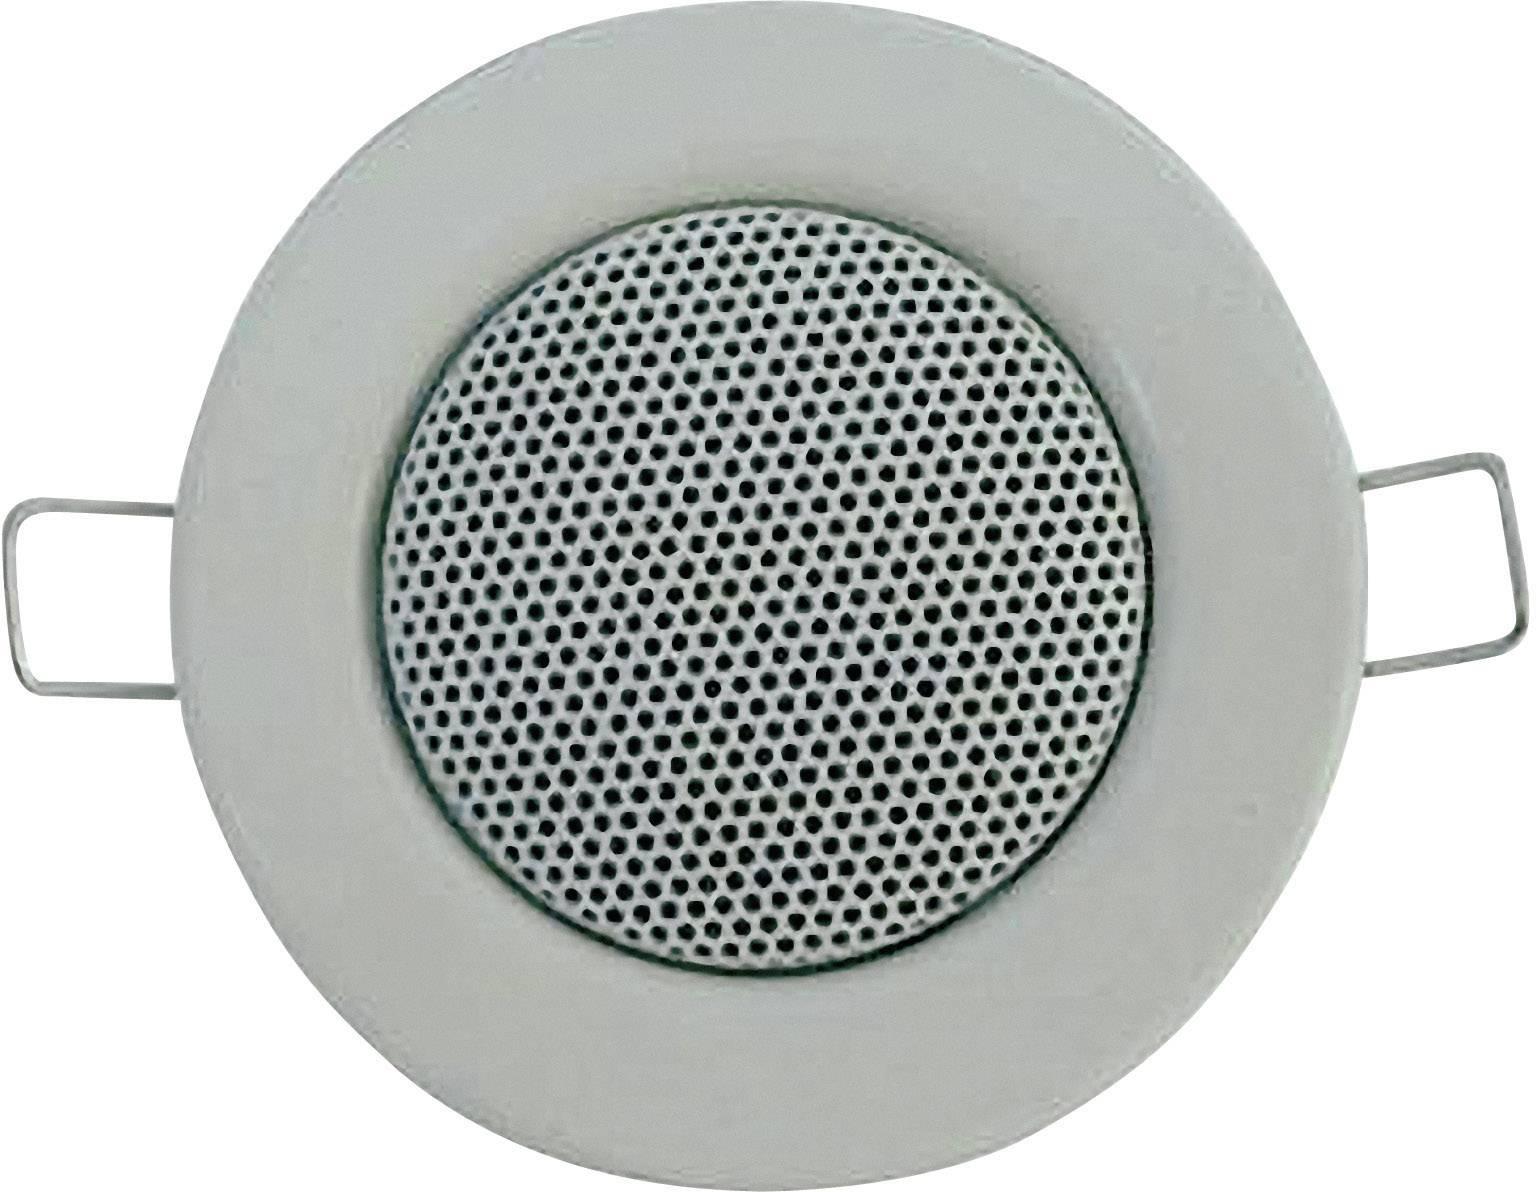 Vestavný reproduktor s designem halogenky, 8 Ω, 1,5/3 W, bílá